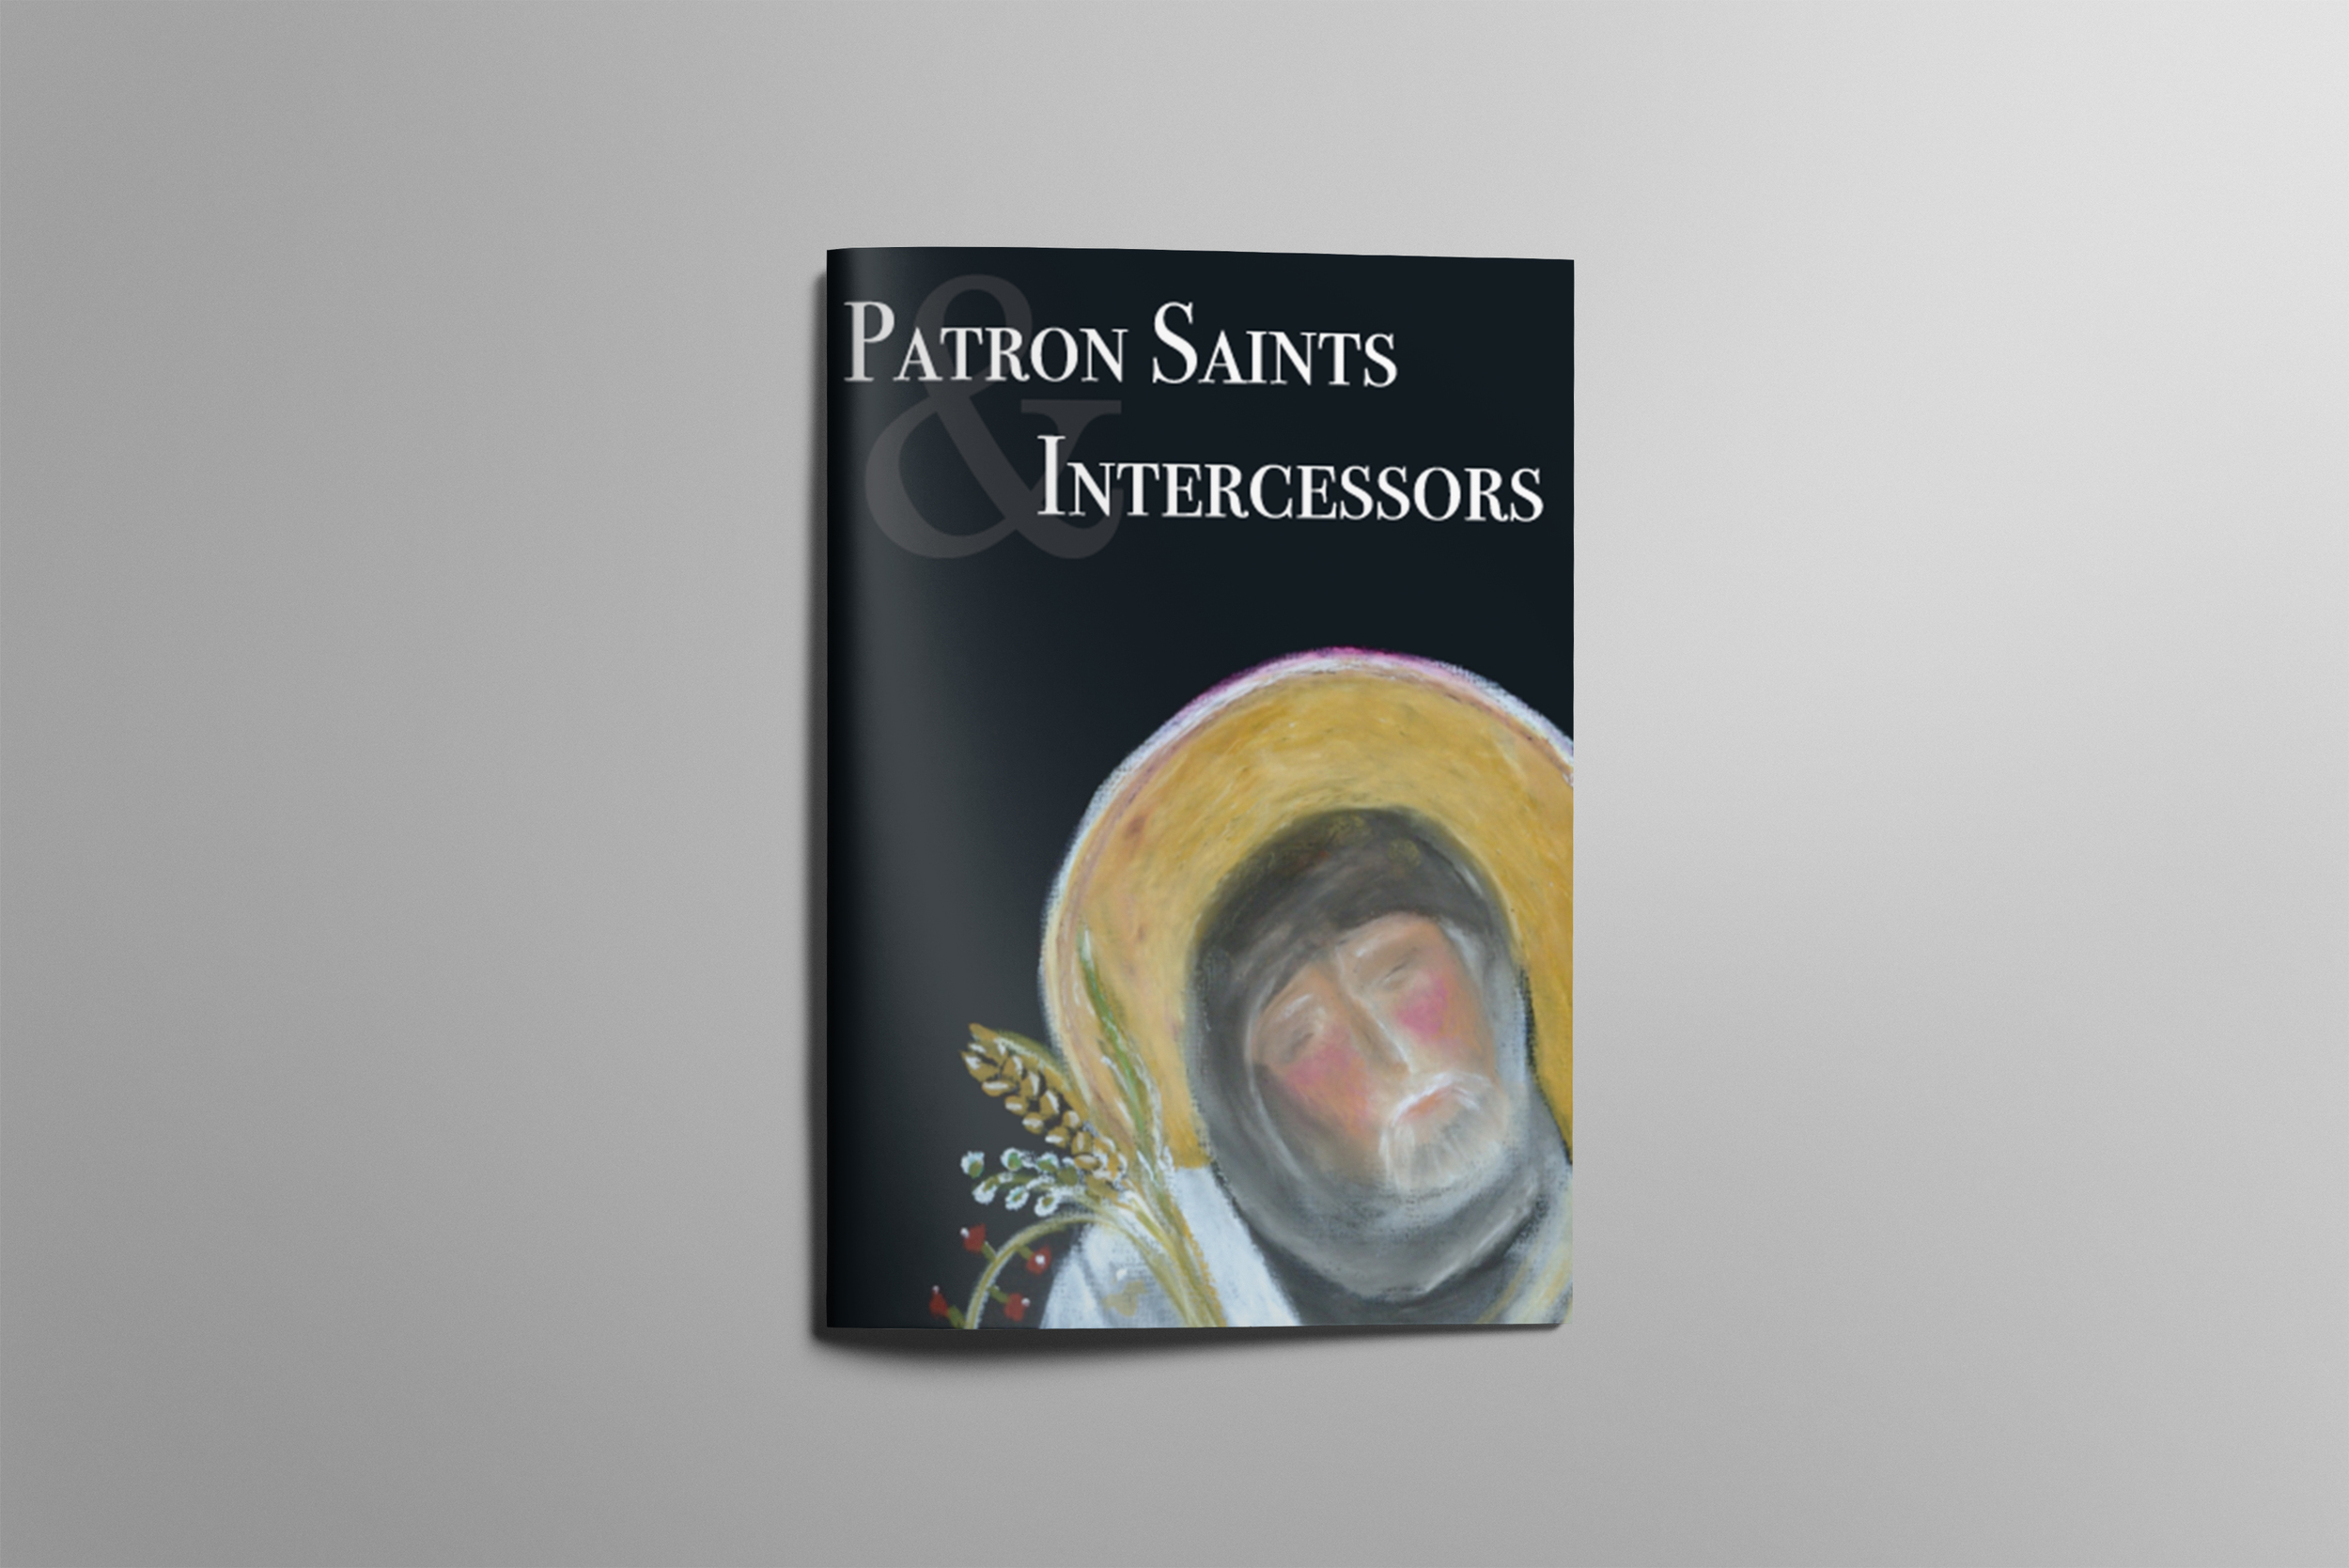 Patron Saints and Intercessors Brochure Cover.PNG